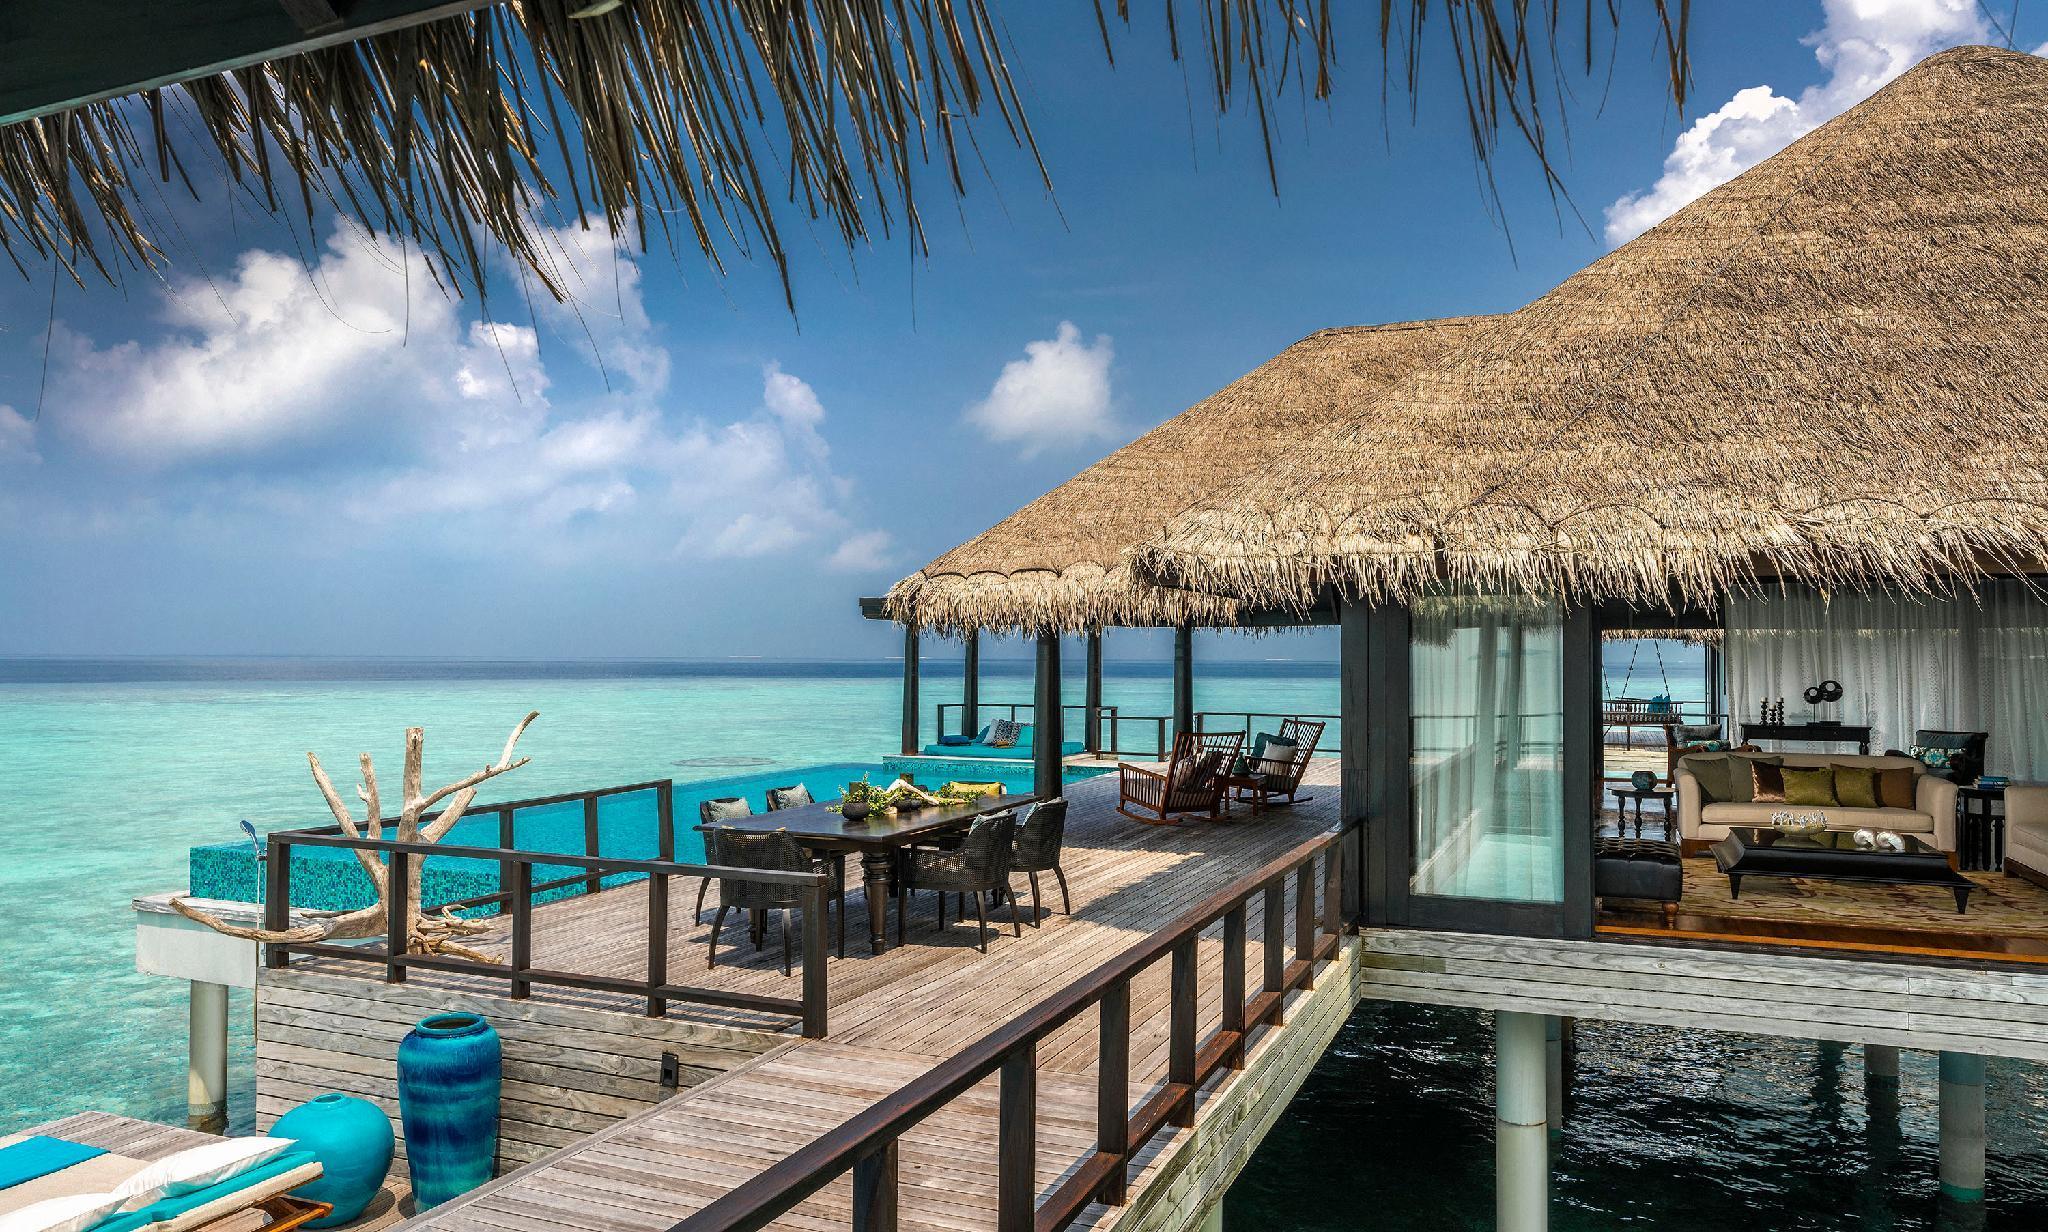 Best Price On Anantara Kihavah Maldives Villas In Maldives